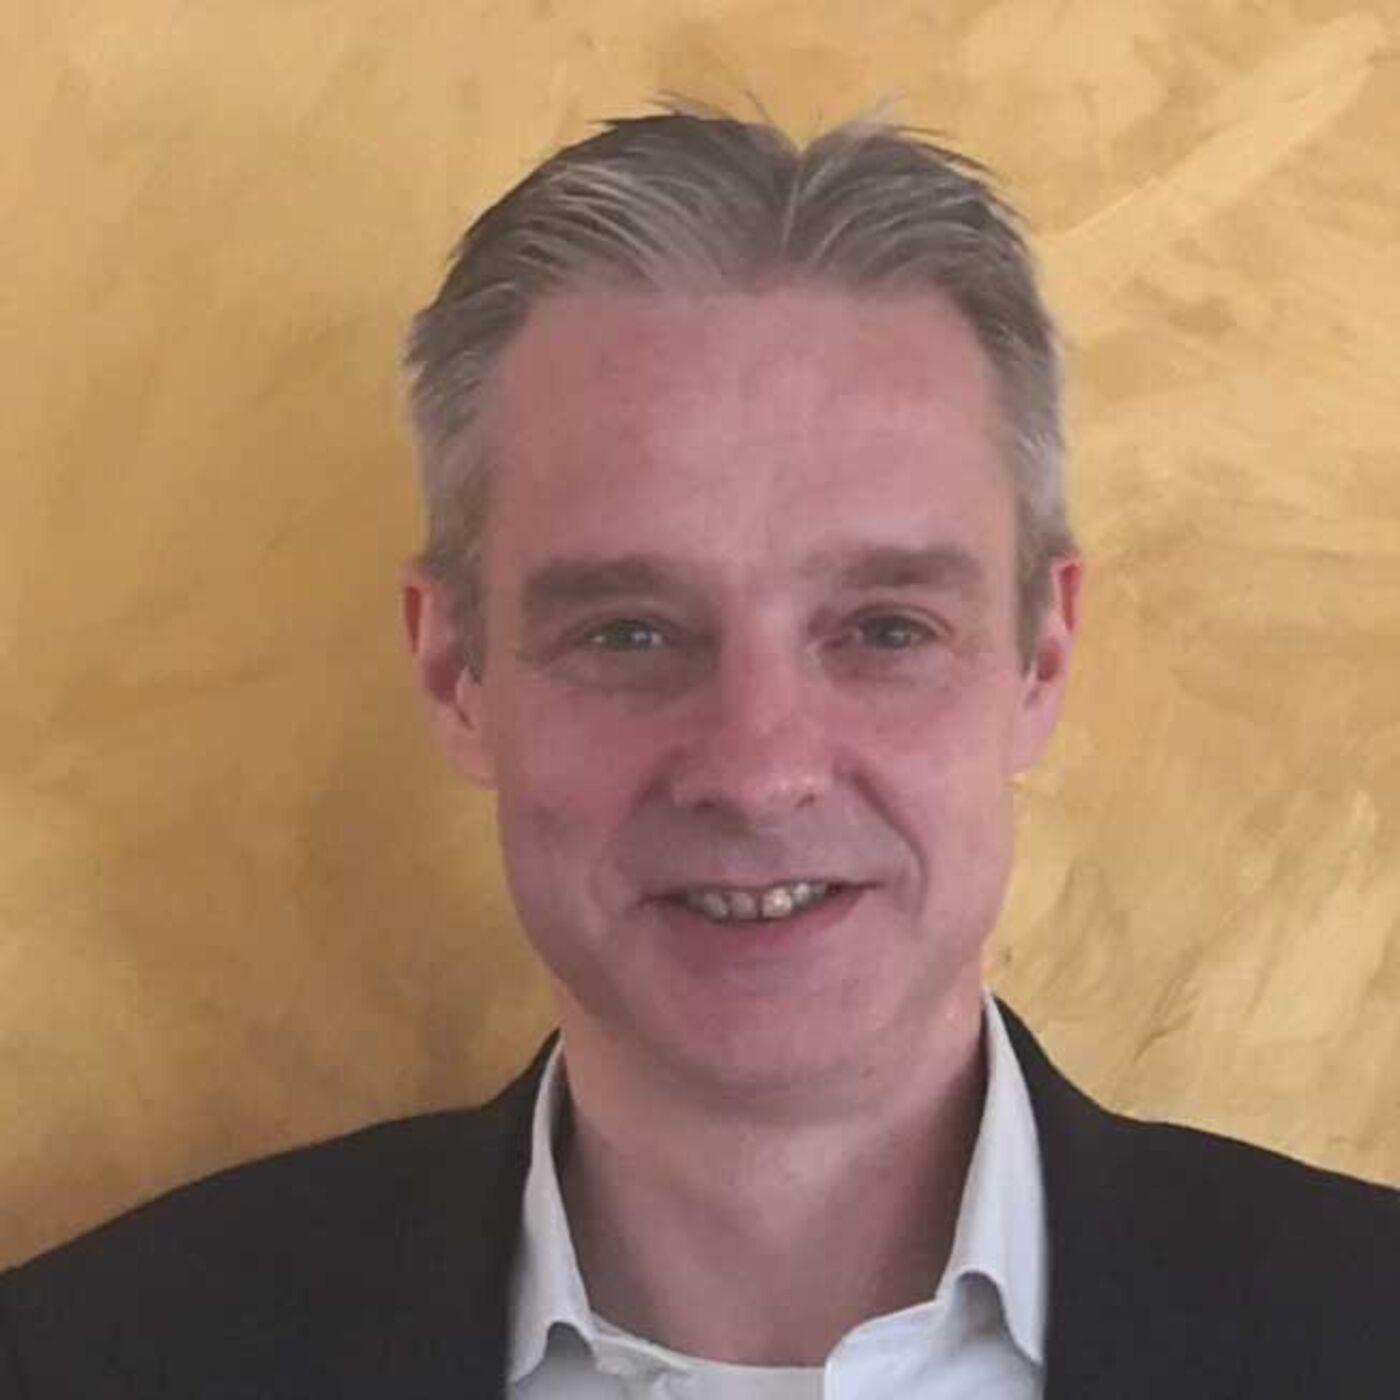 Digitaliseringsdirektoratet og Steffen Sutorius